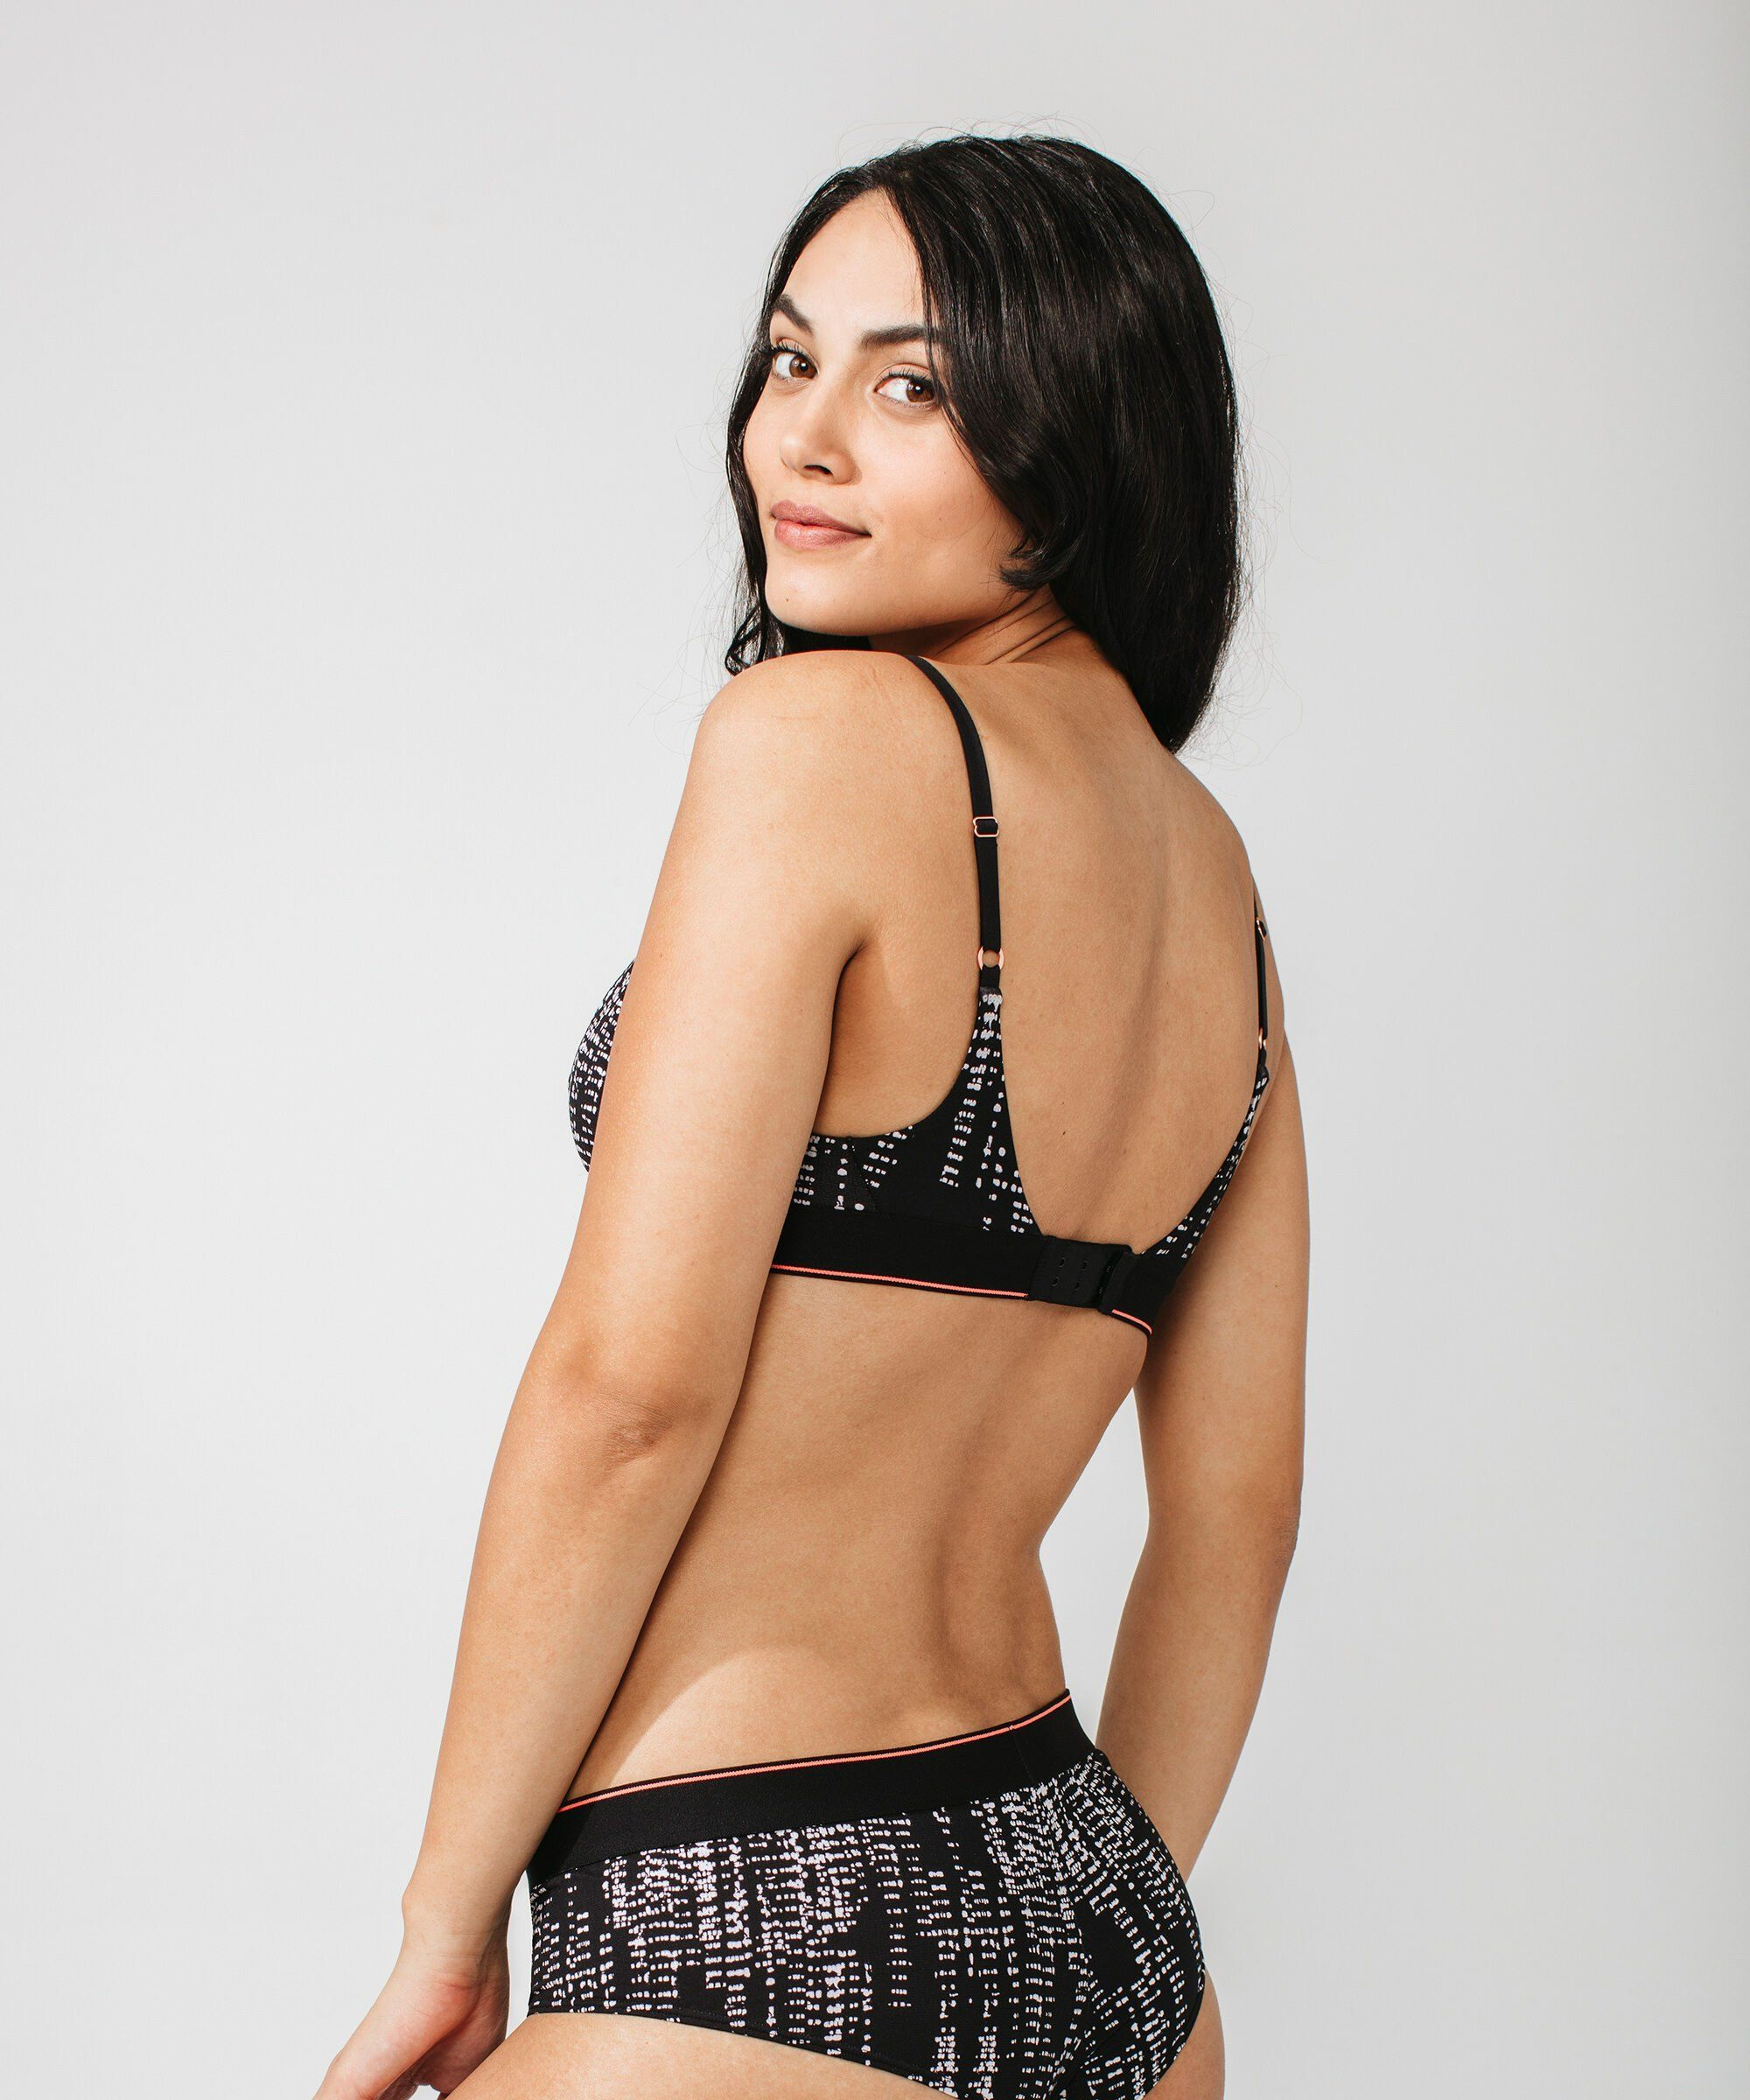 Chef reccomend Voyeur pictures of women in underwear